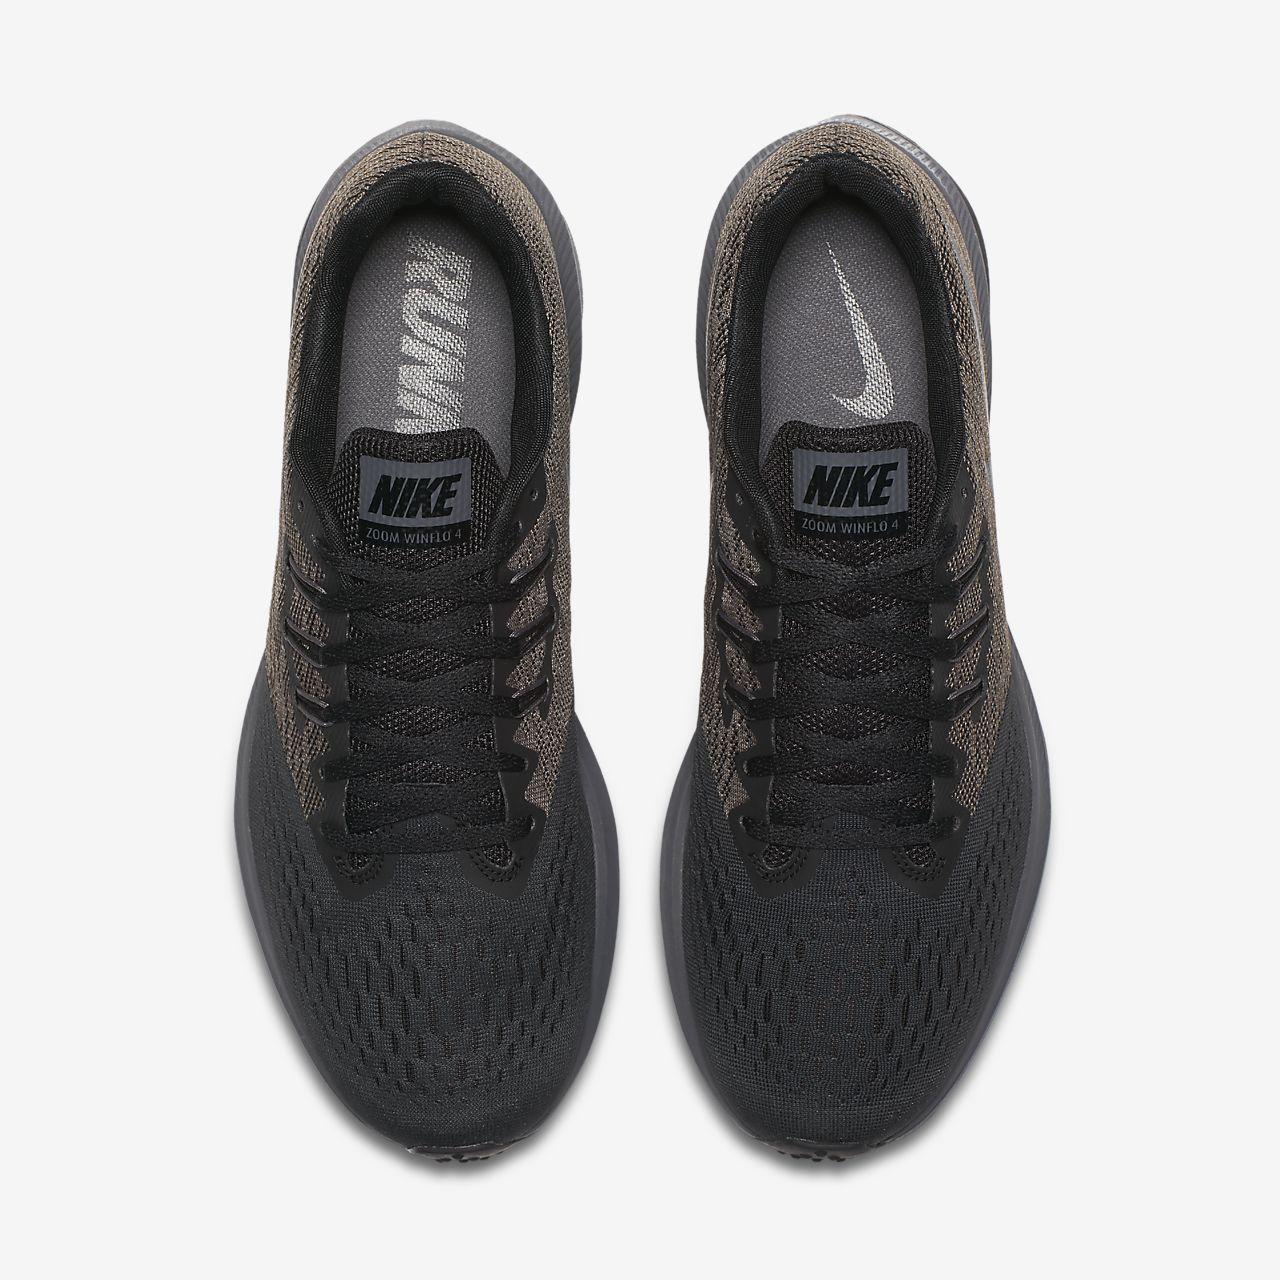 2499d0a60a26 Nike Zoom Winflo 4 Men s Running Shoe. Nike.com AU